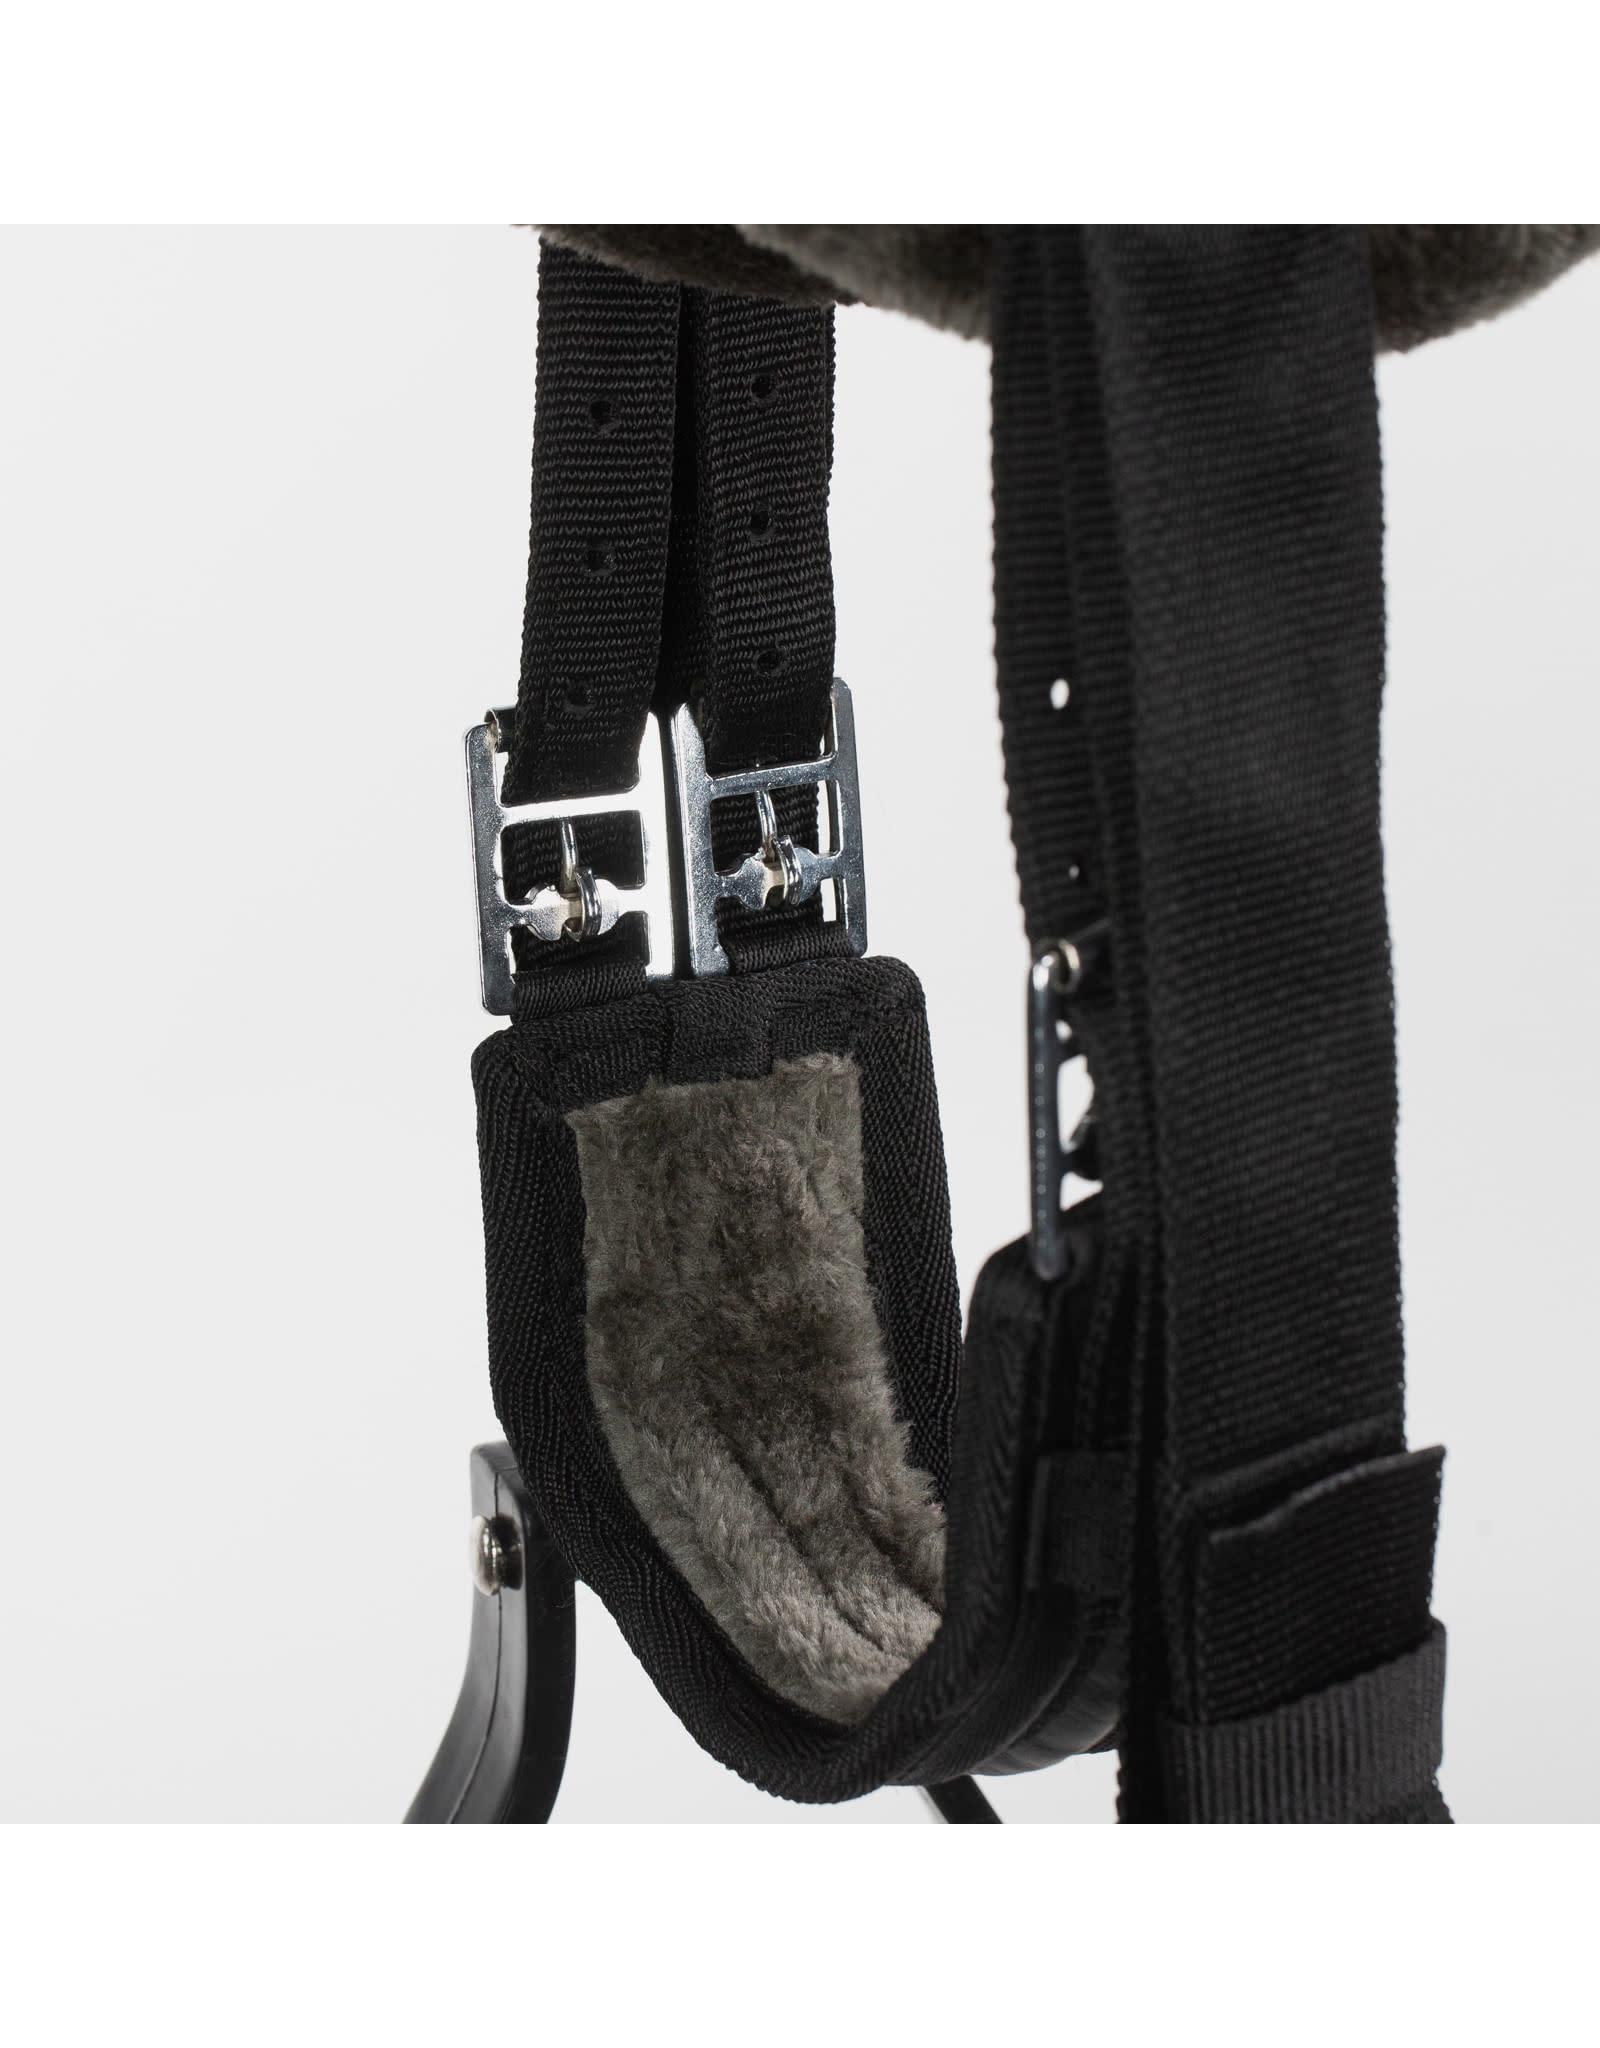 Equinavia Bareback Saddle Pad Set Black/Grey Full